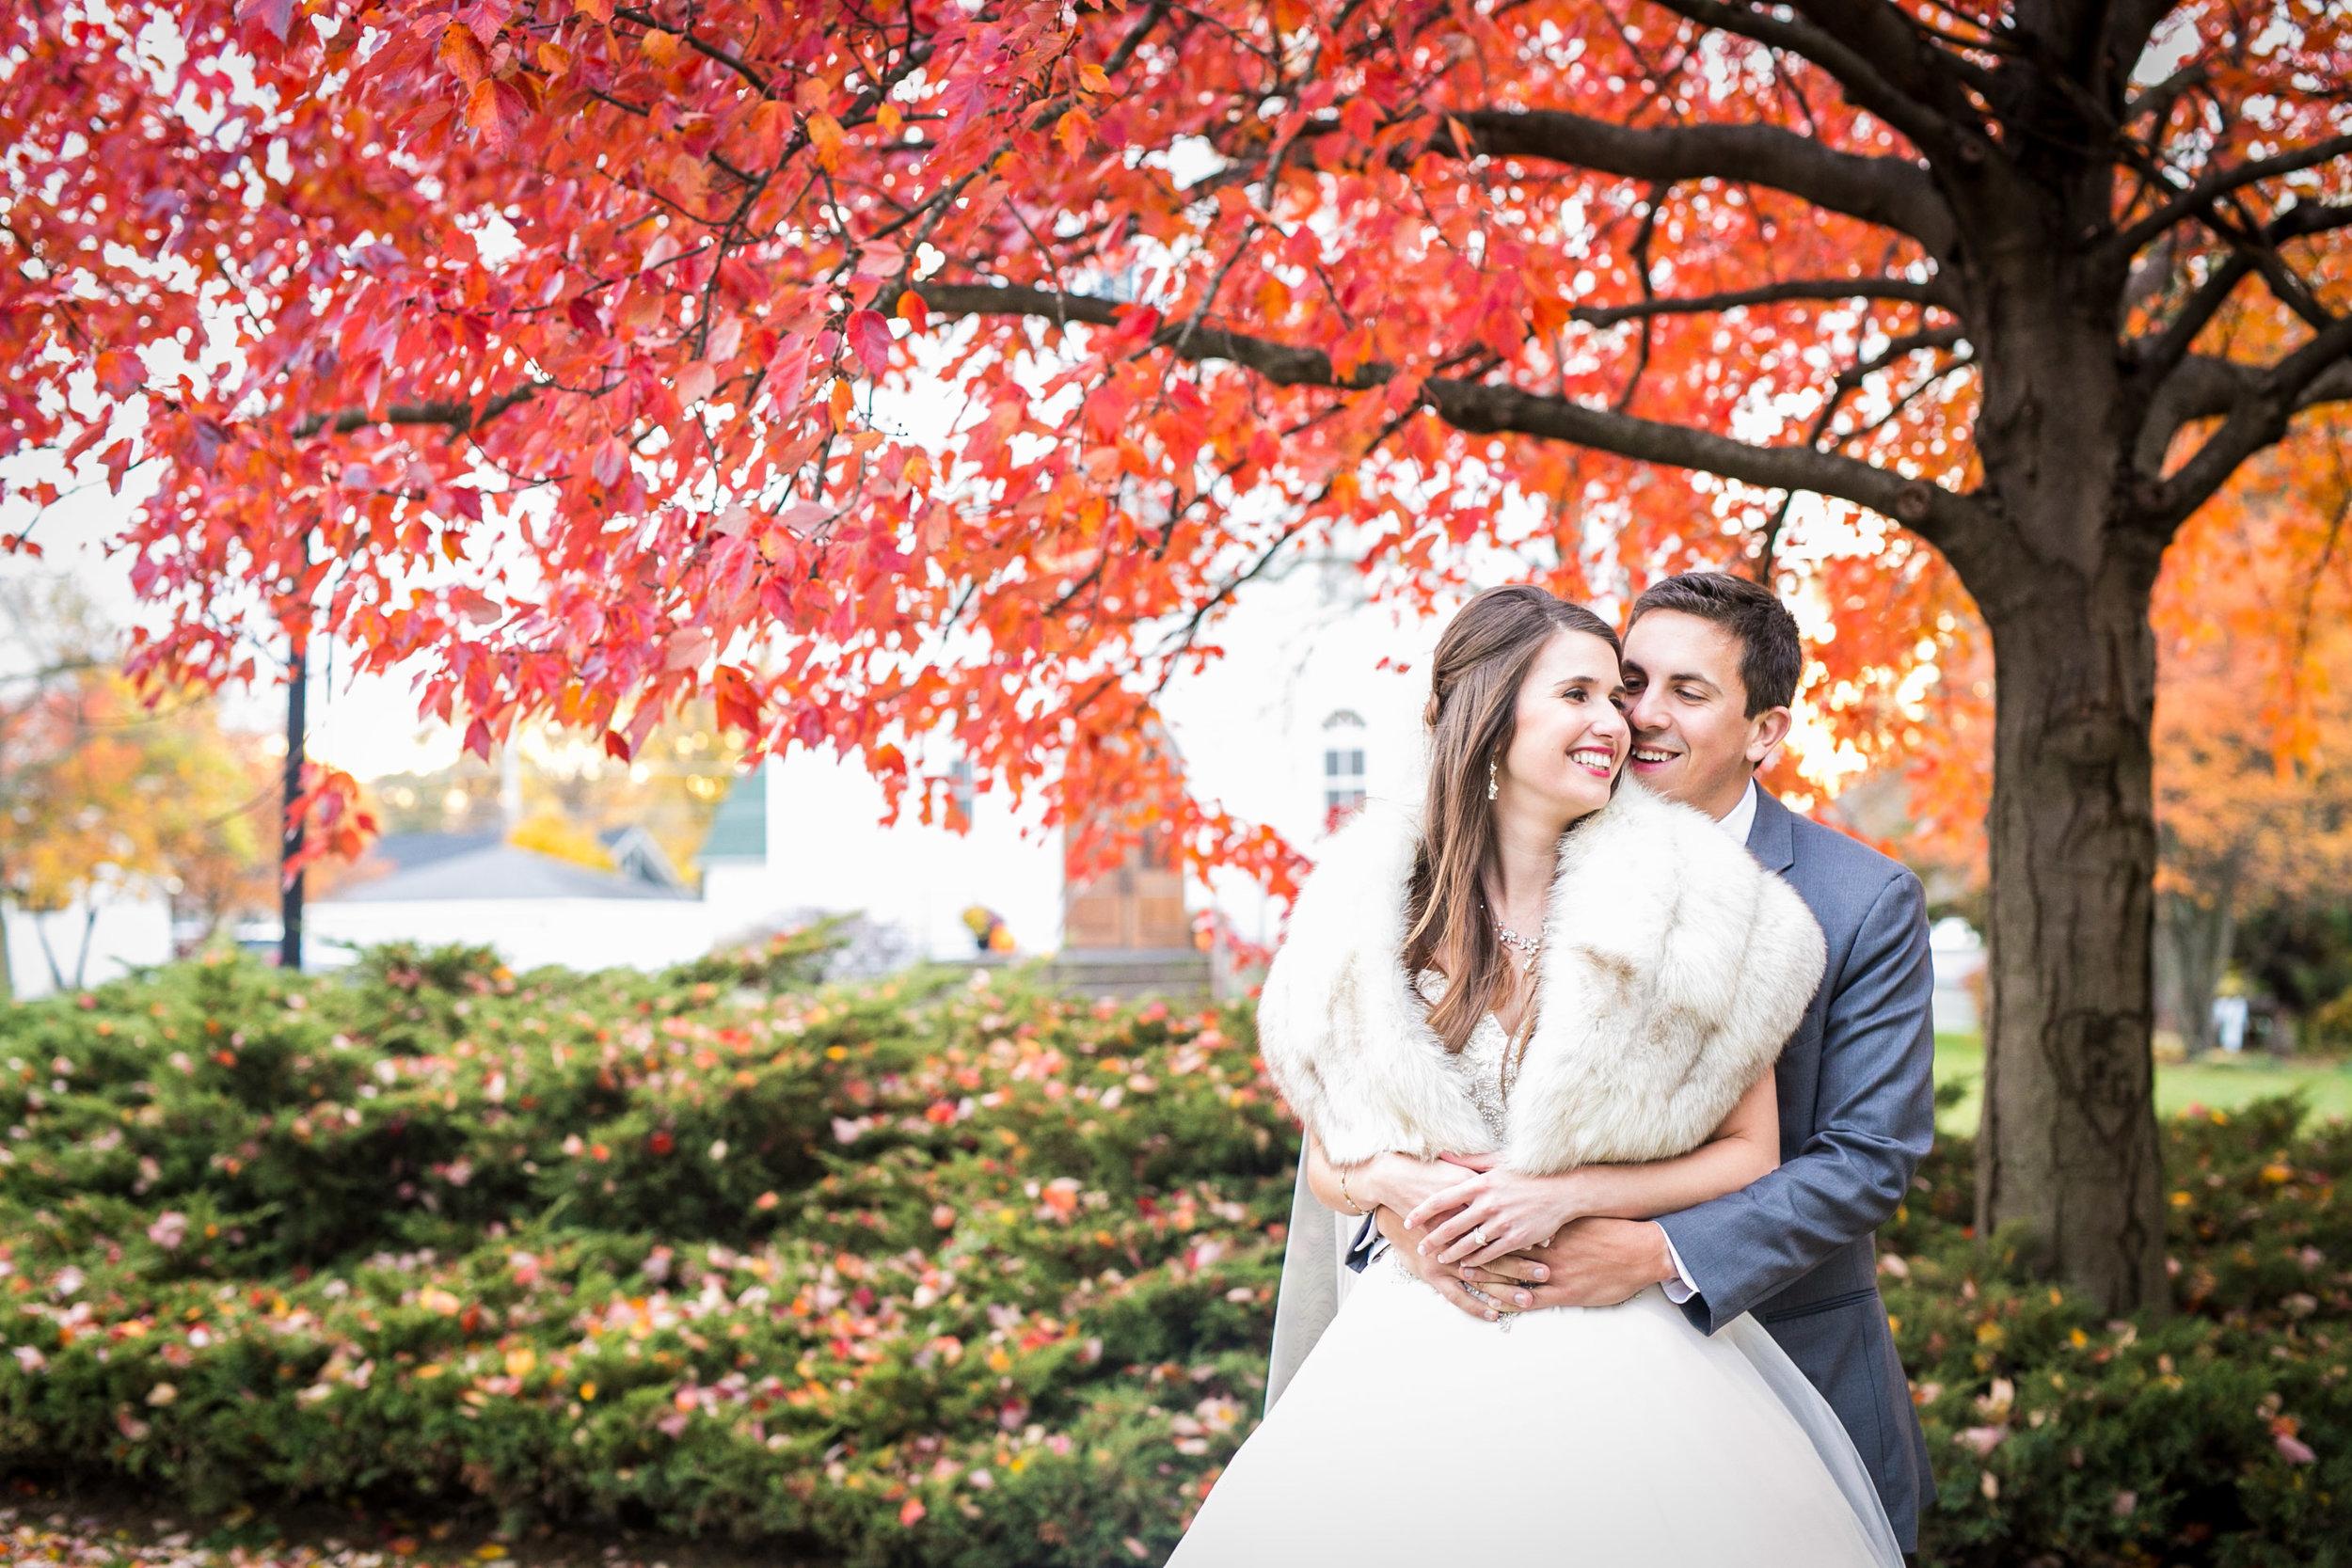 bride and groom hugging outdoors